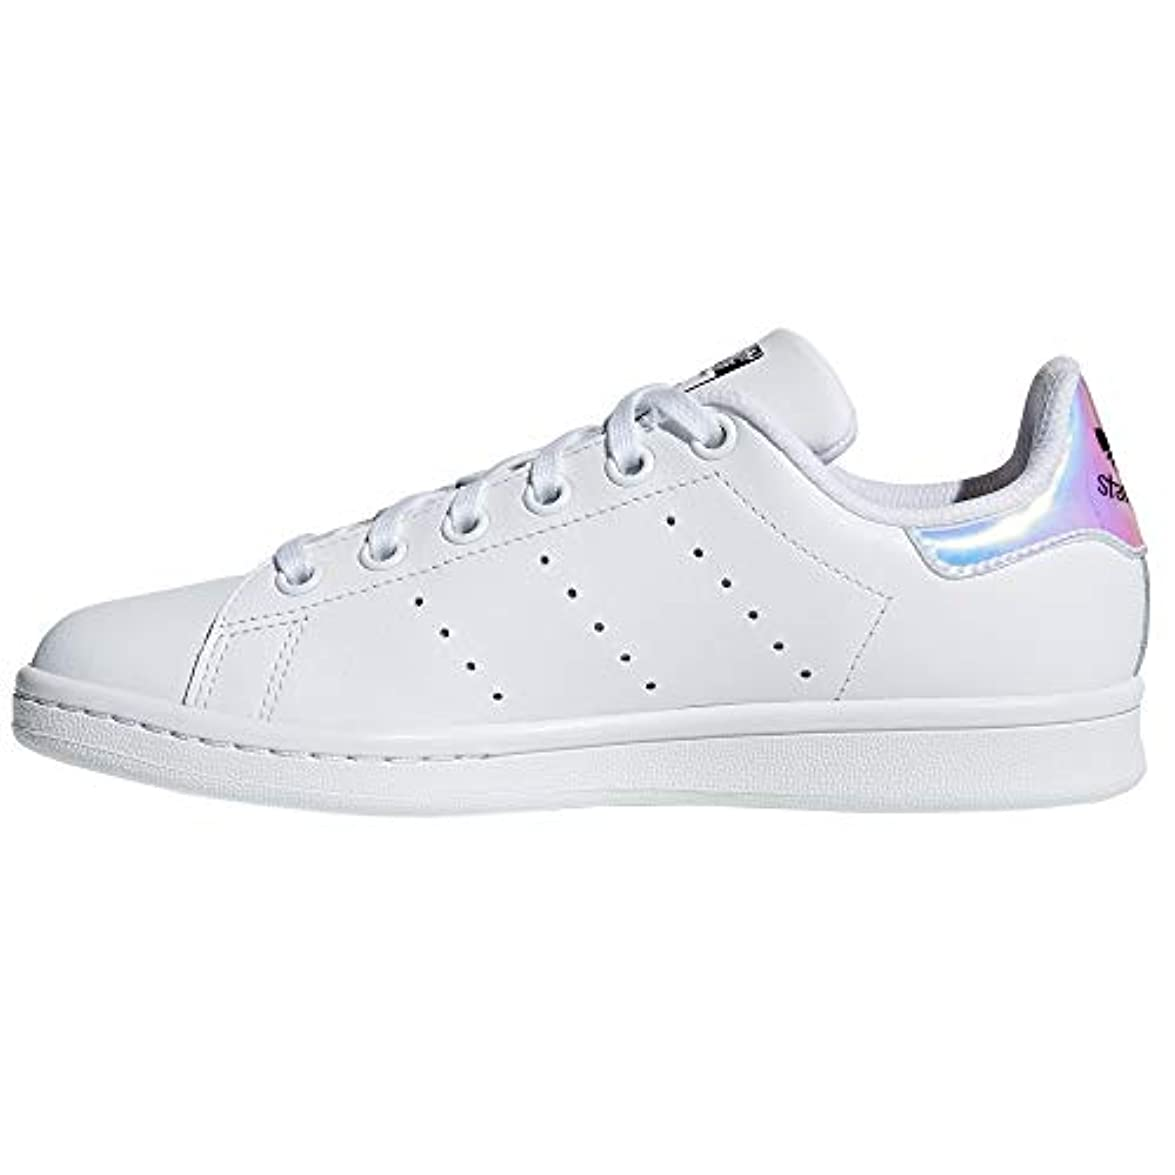 Adidas Stan Smith Argento Donna Scarpe Da Ginnastica Sneaker